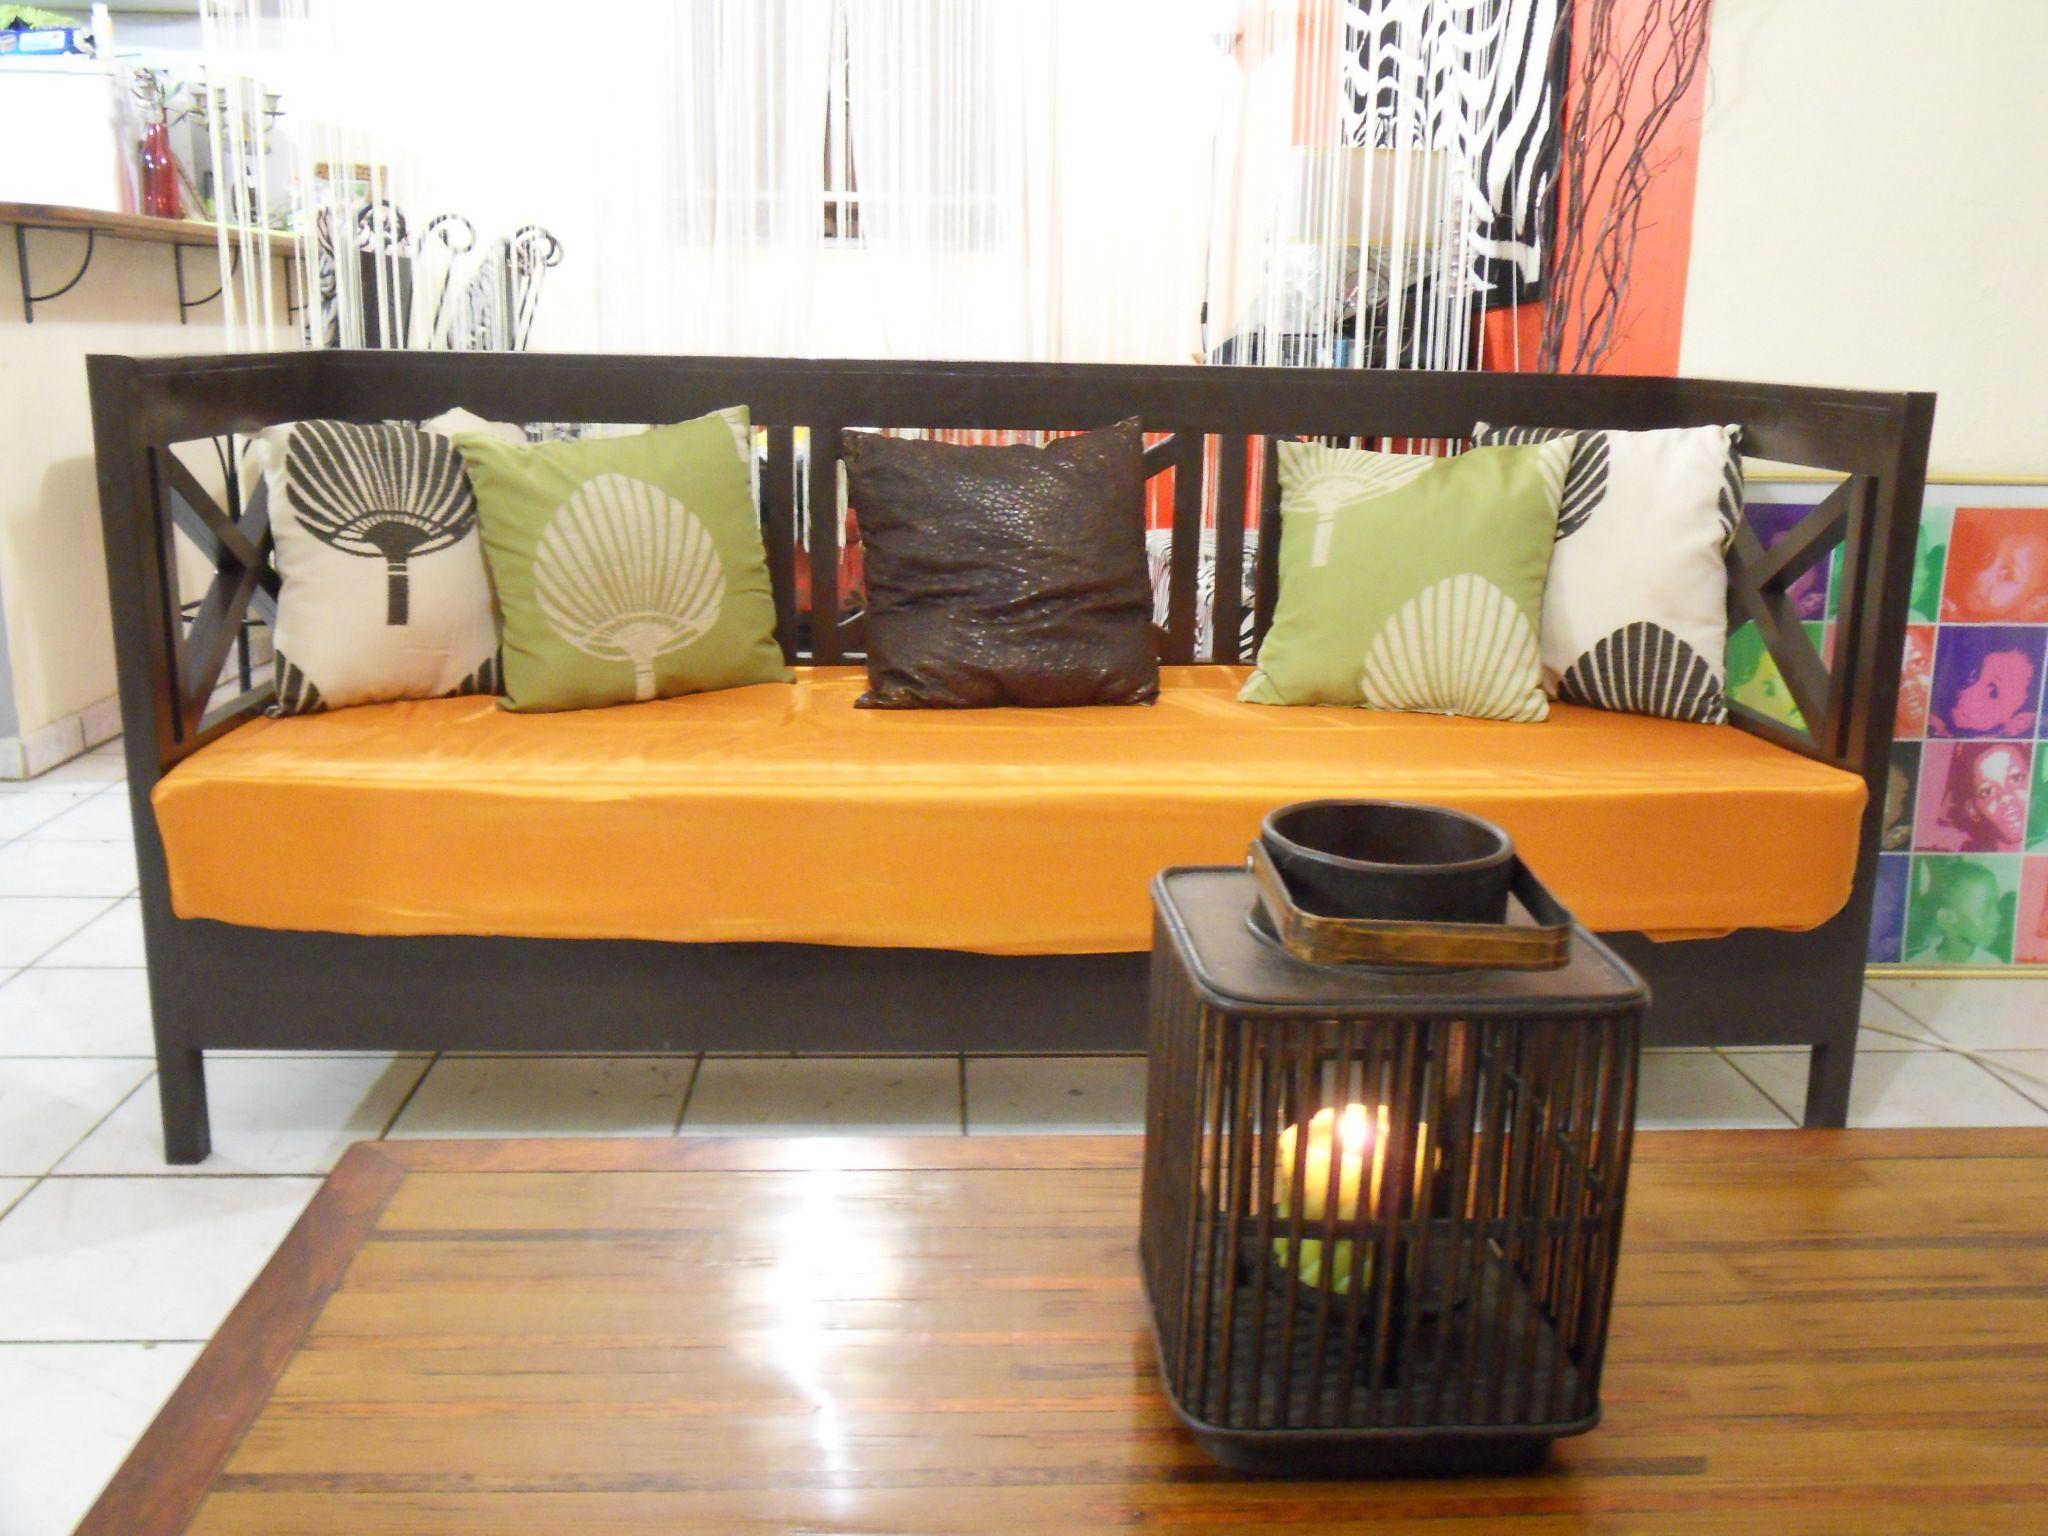 42 DIY Sofa Plans Free Instructions | Diy furniture ...